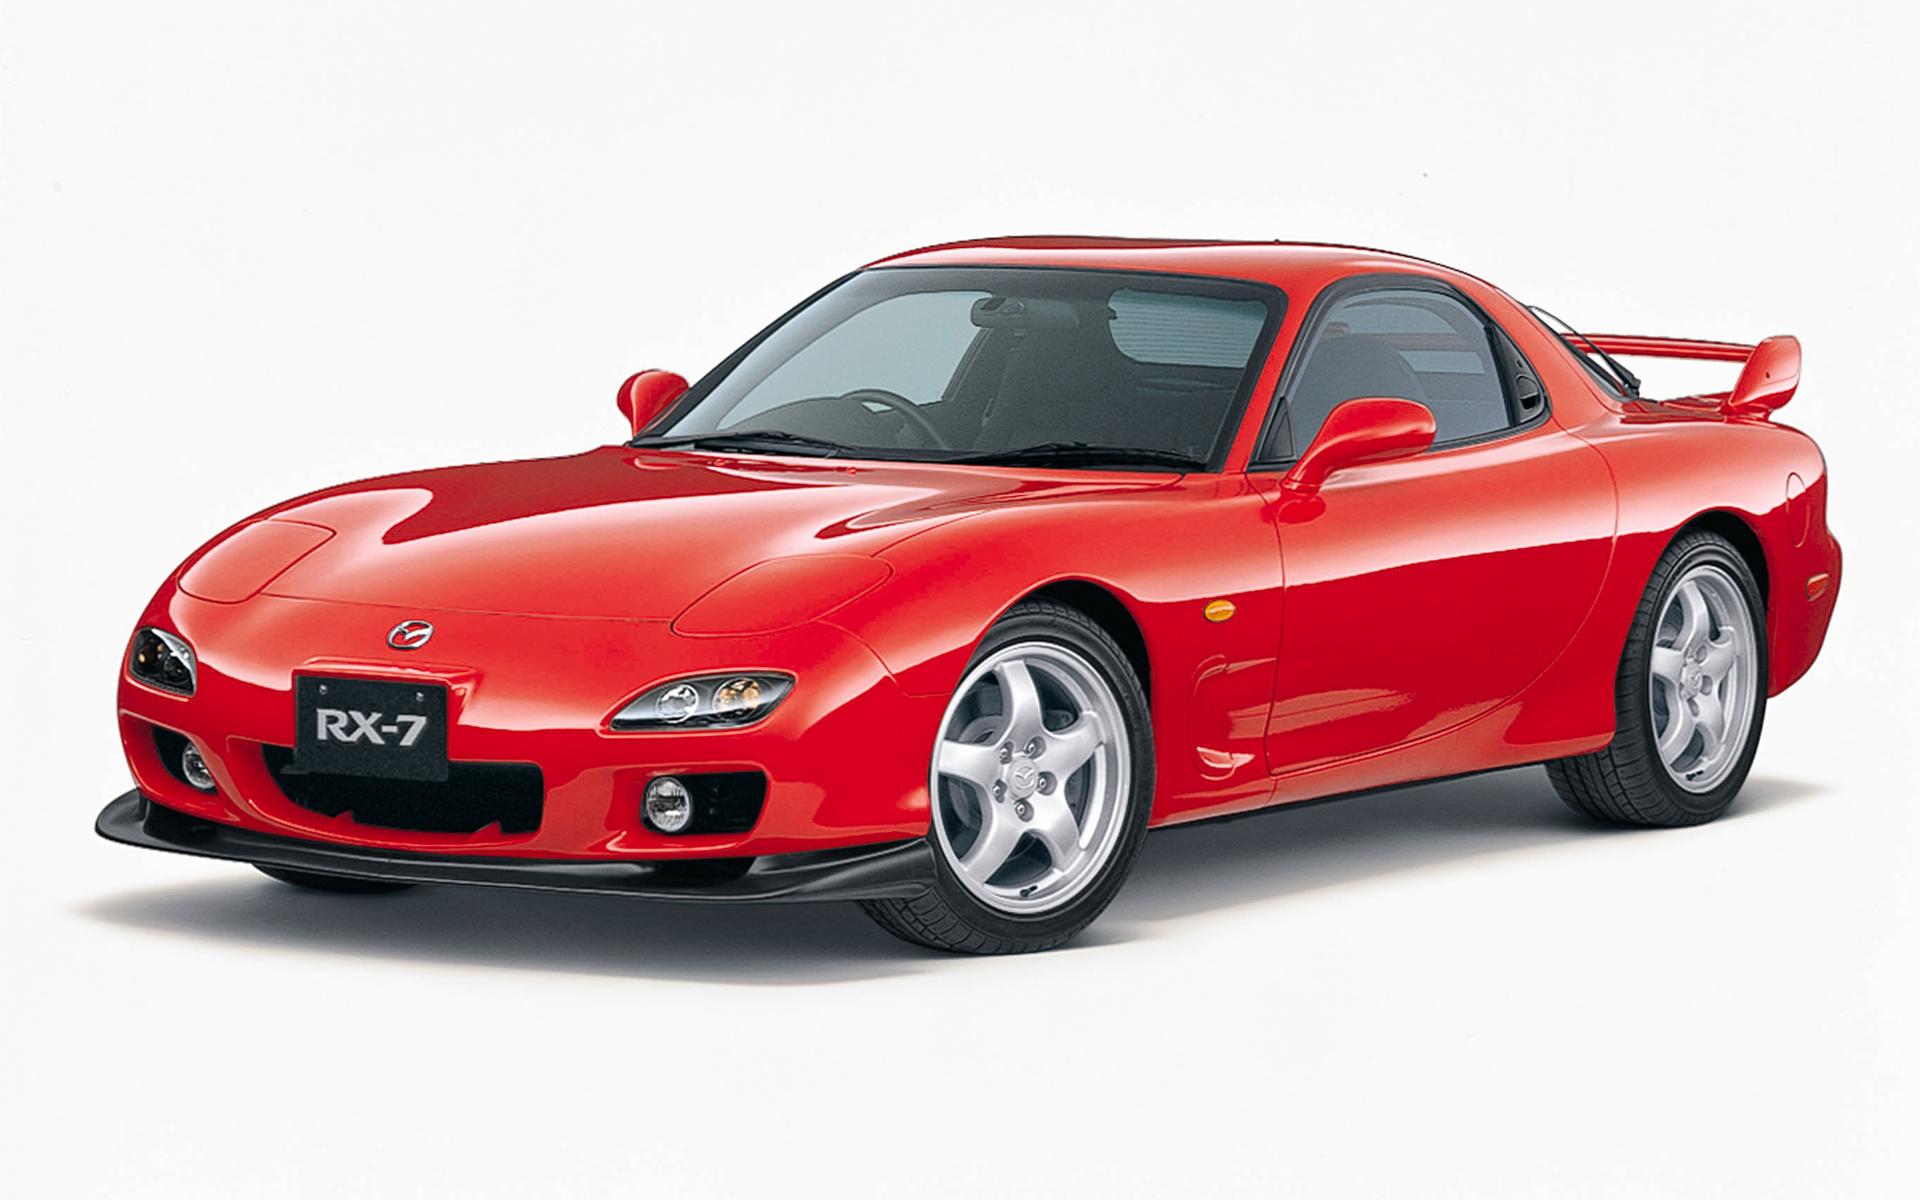 Kekurangan Mazda Rx7 Fd3S Tangguh